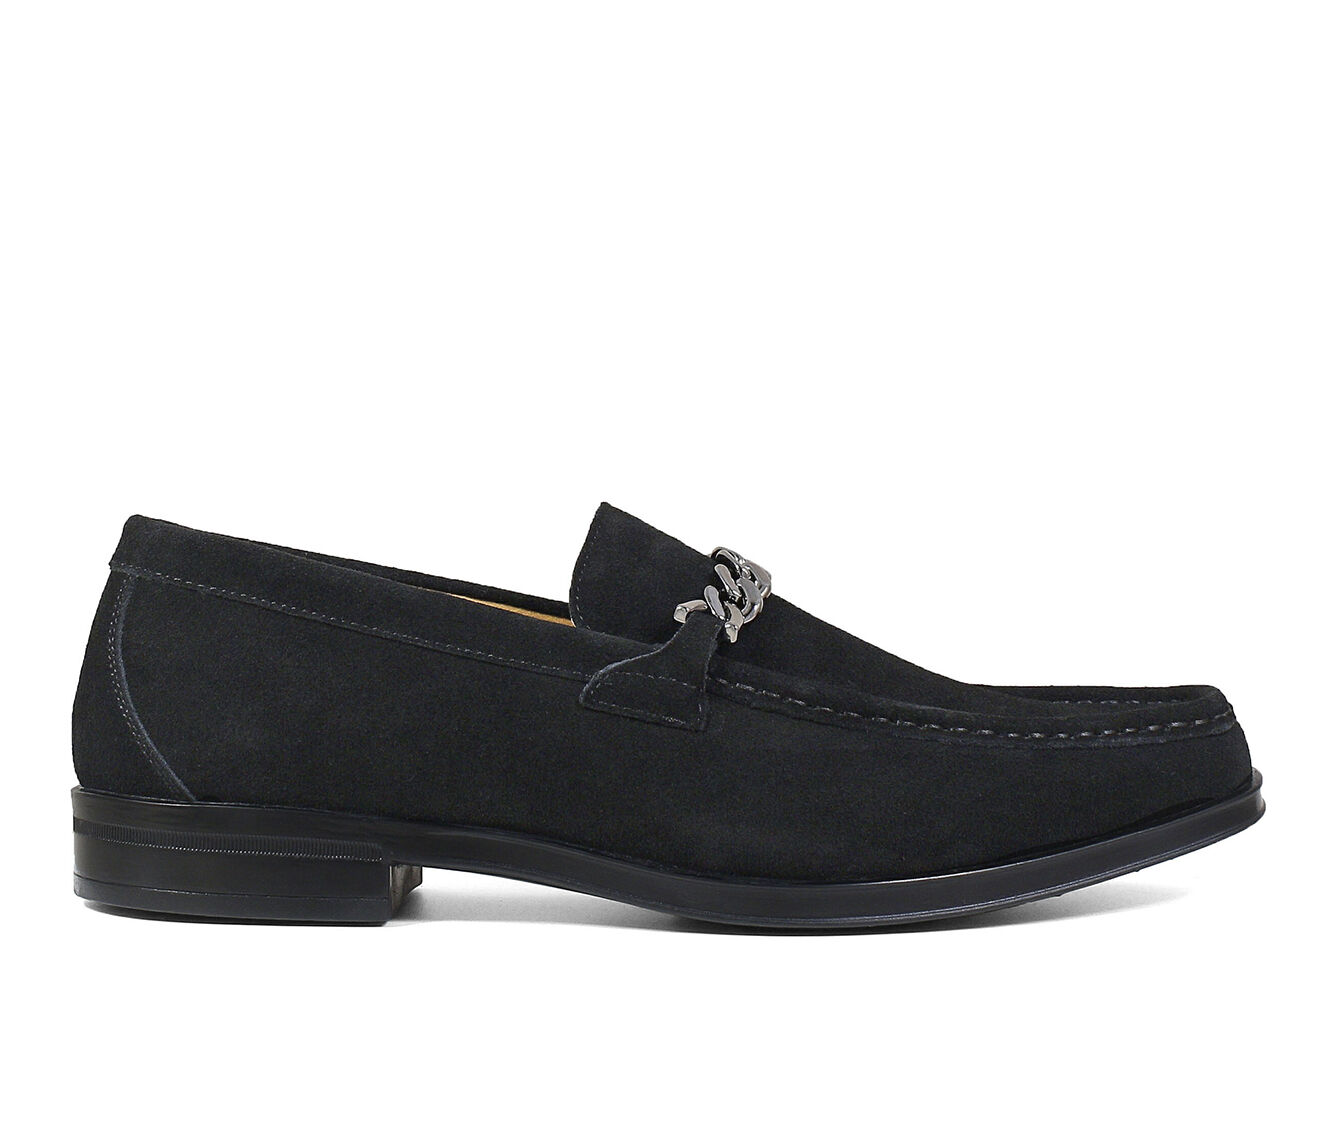 Men's Stacy Adams Norwood Dress Shoes Black